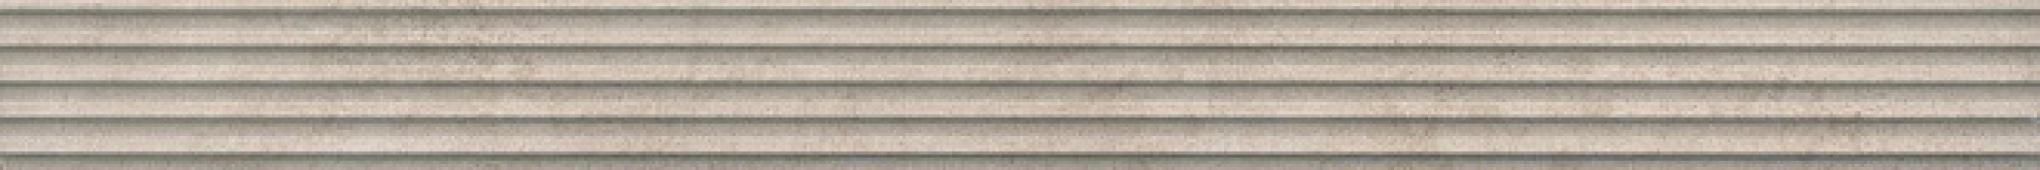 Бордюр Пикарди структура беж 40*3,4